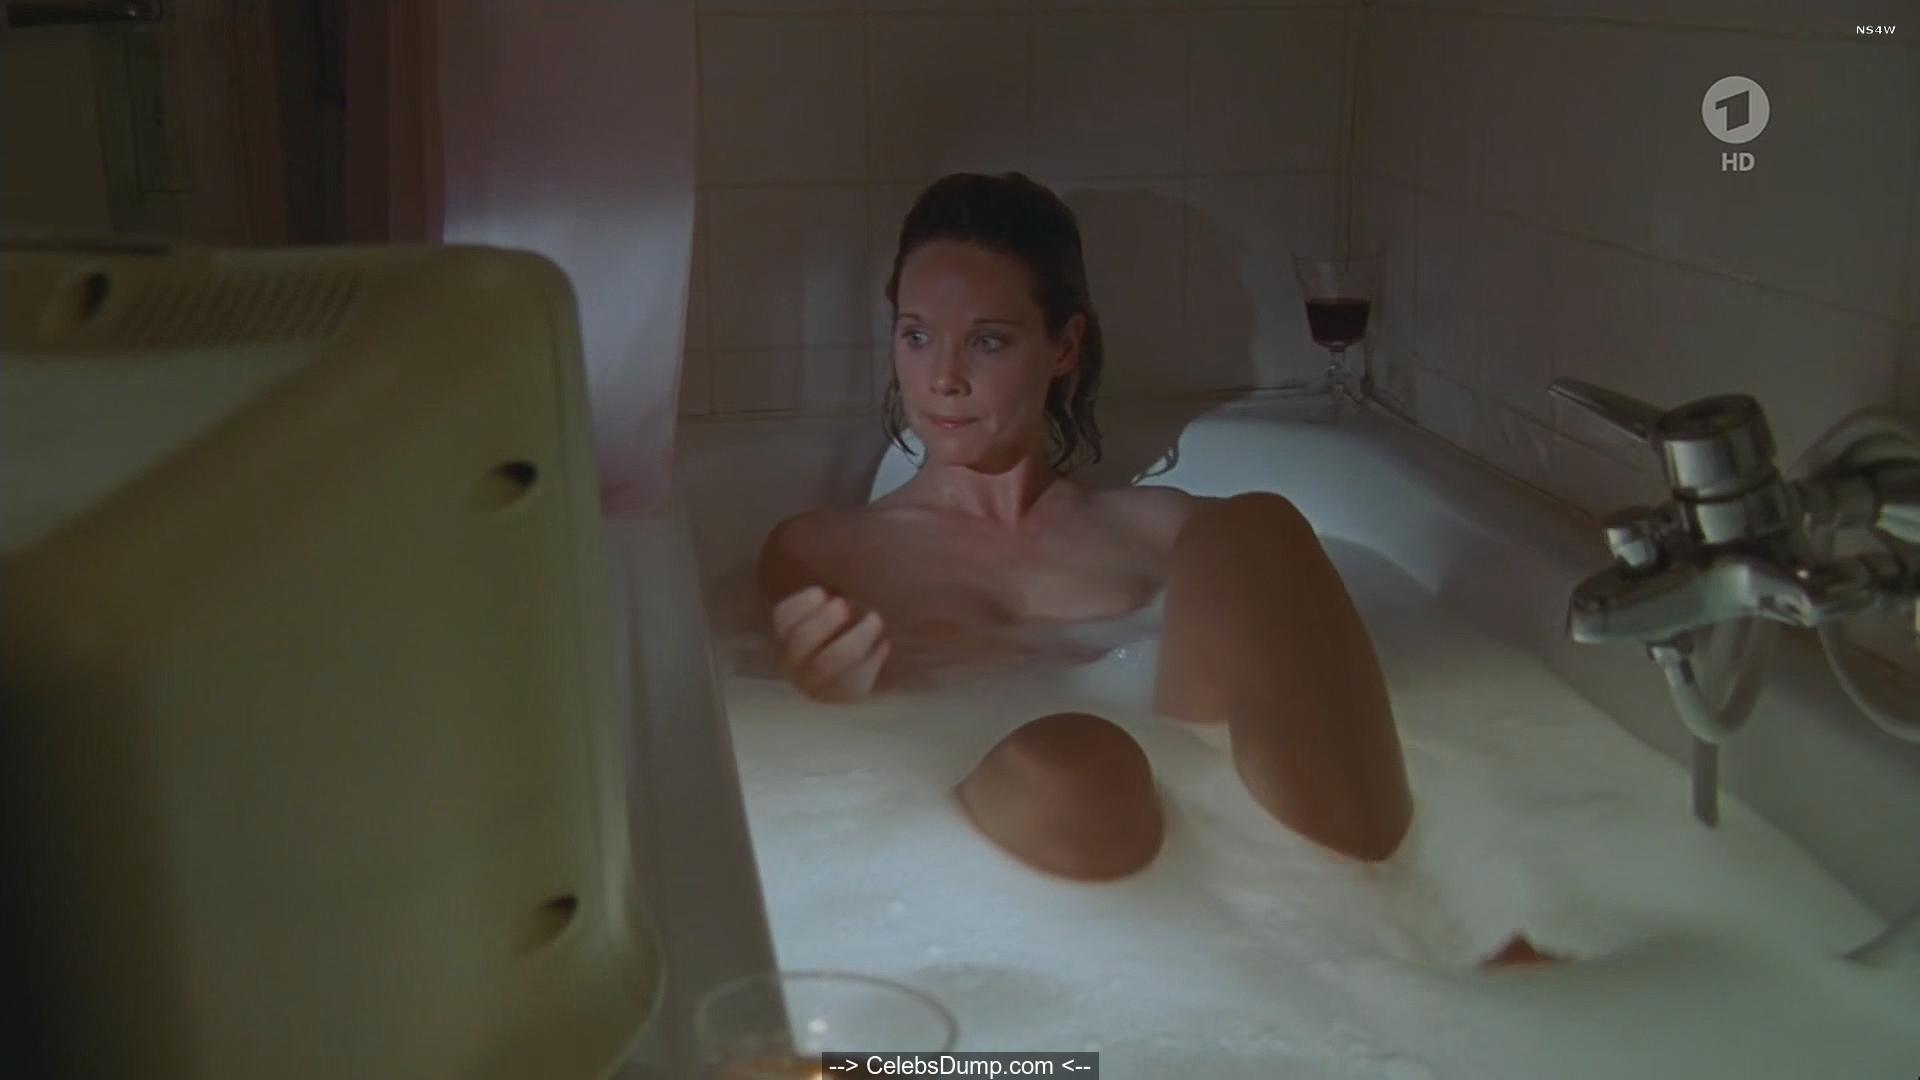 Nackt kramer ann-kathrin Ashley Roberts